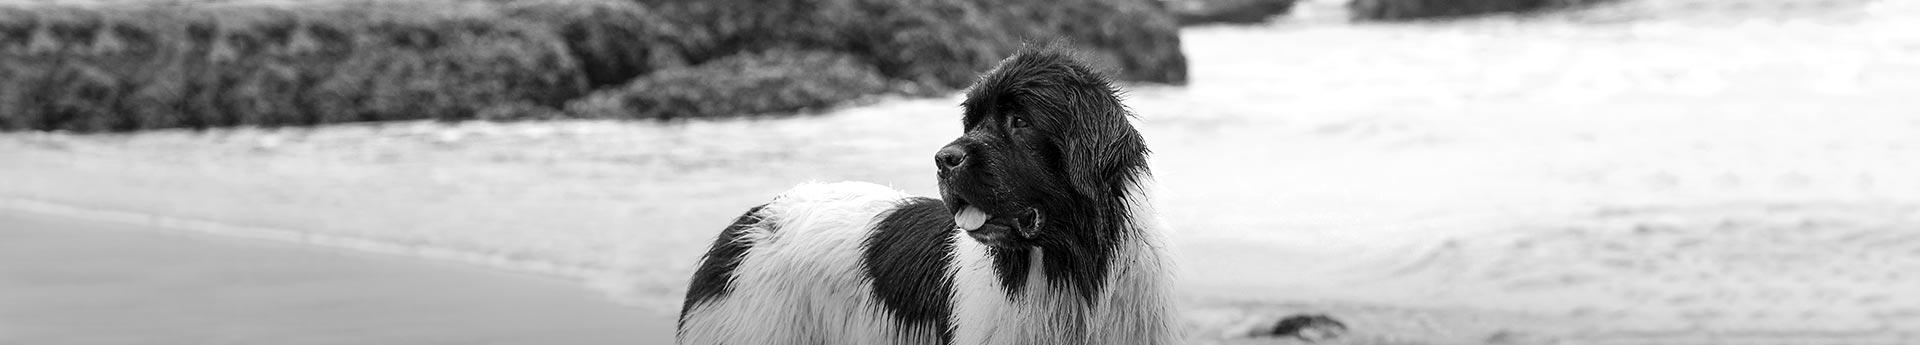 ORIJEN Six Fish Dog Food - Big black and white dog on an Oregon beach- Friday in Pacific City, Oregon